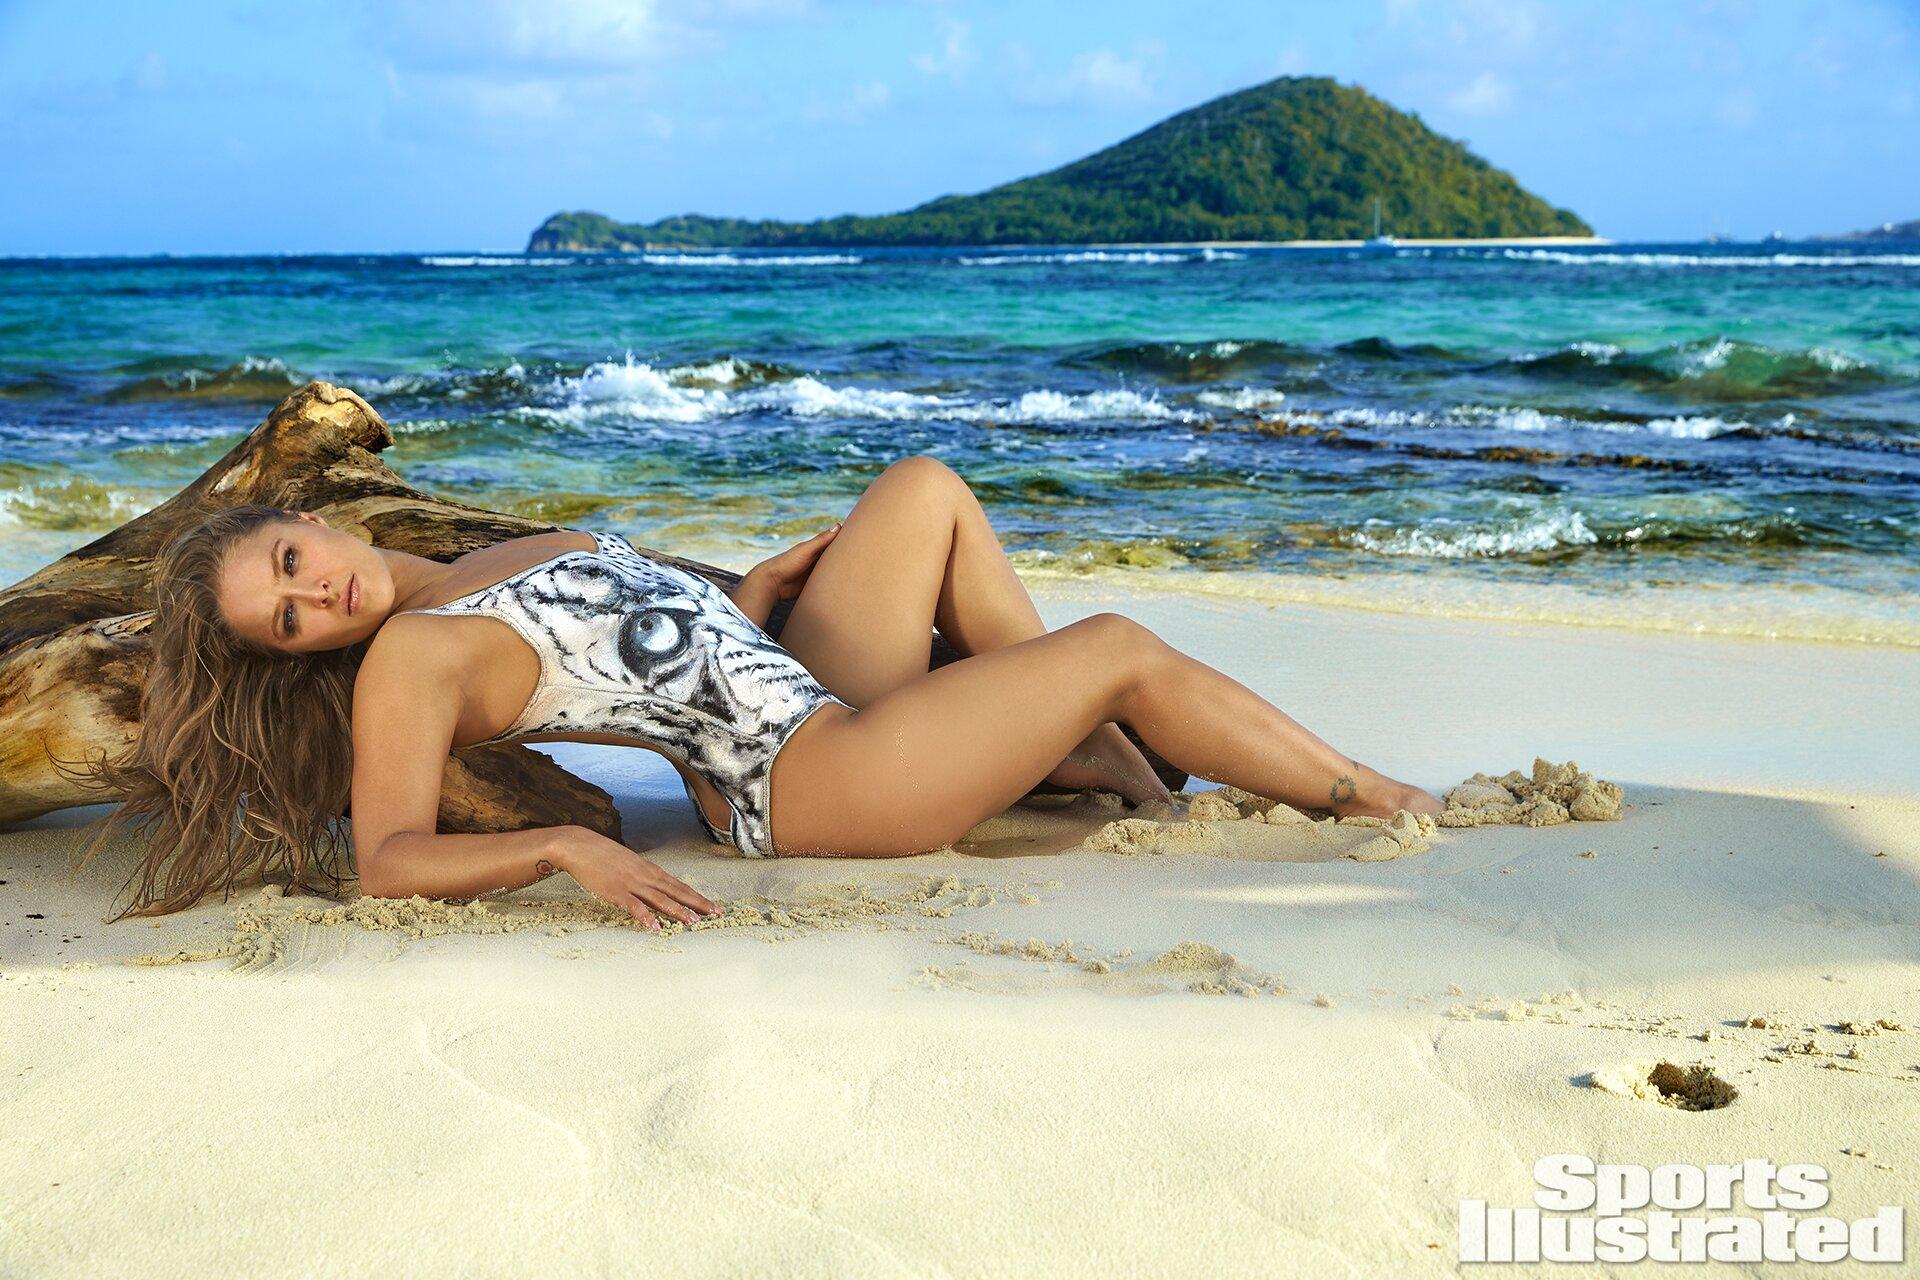 Ronda Rousey 2016 Swimsuit Bodypaint Gallery